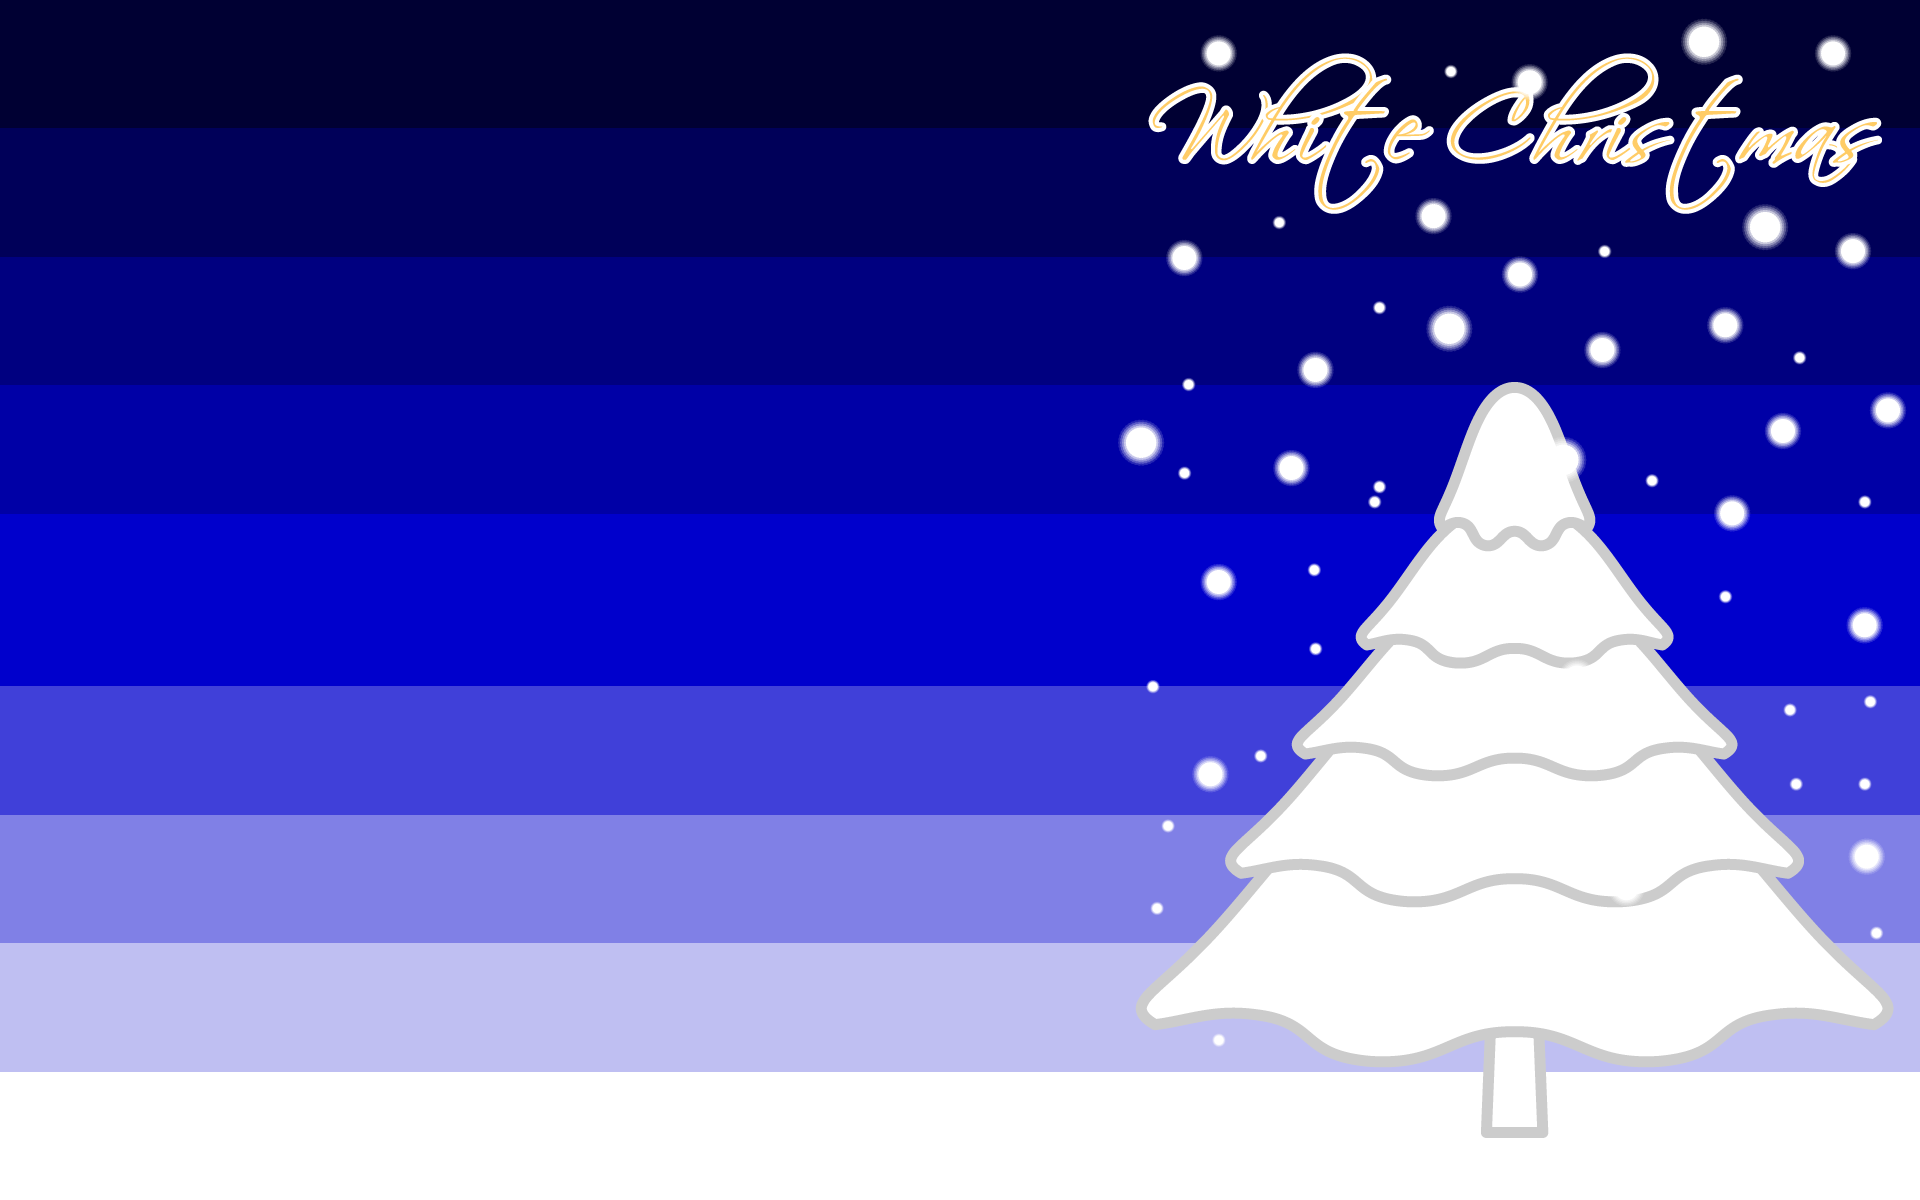 wallpaper6_christmas-white-blue-pc